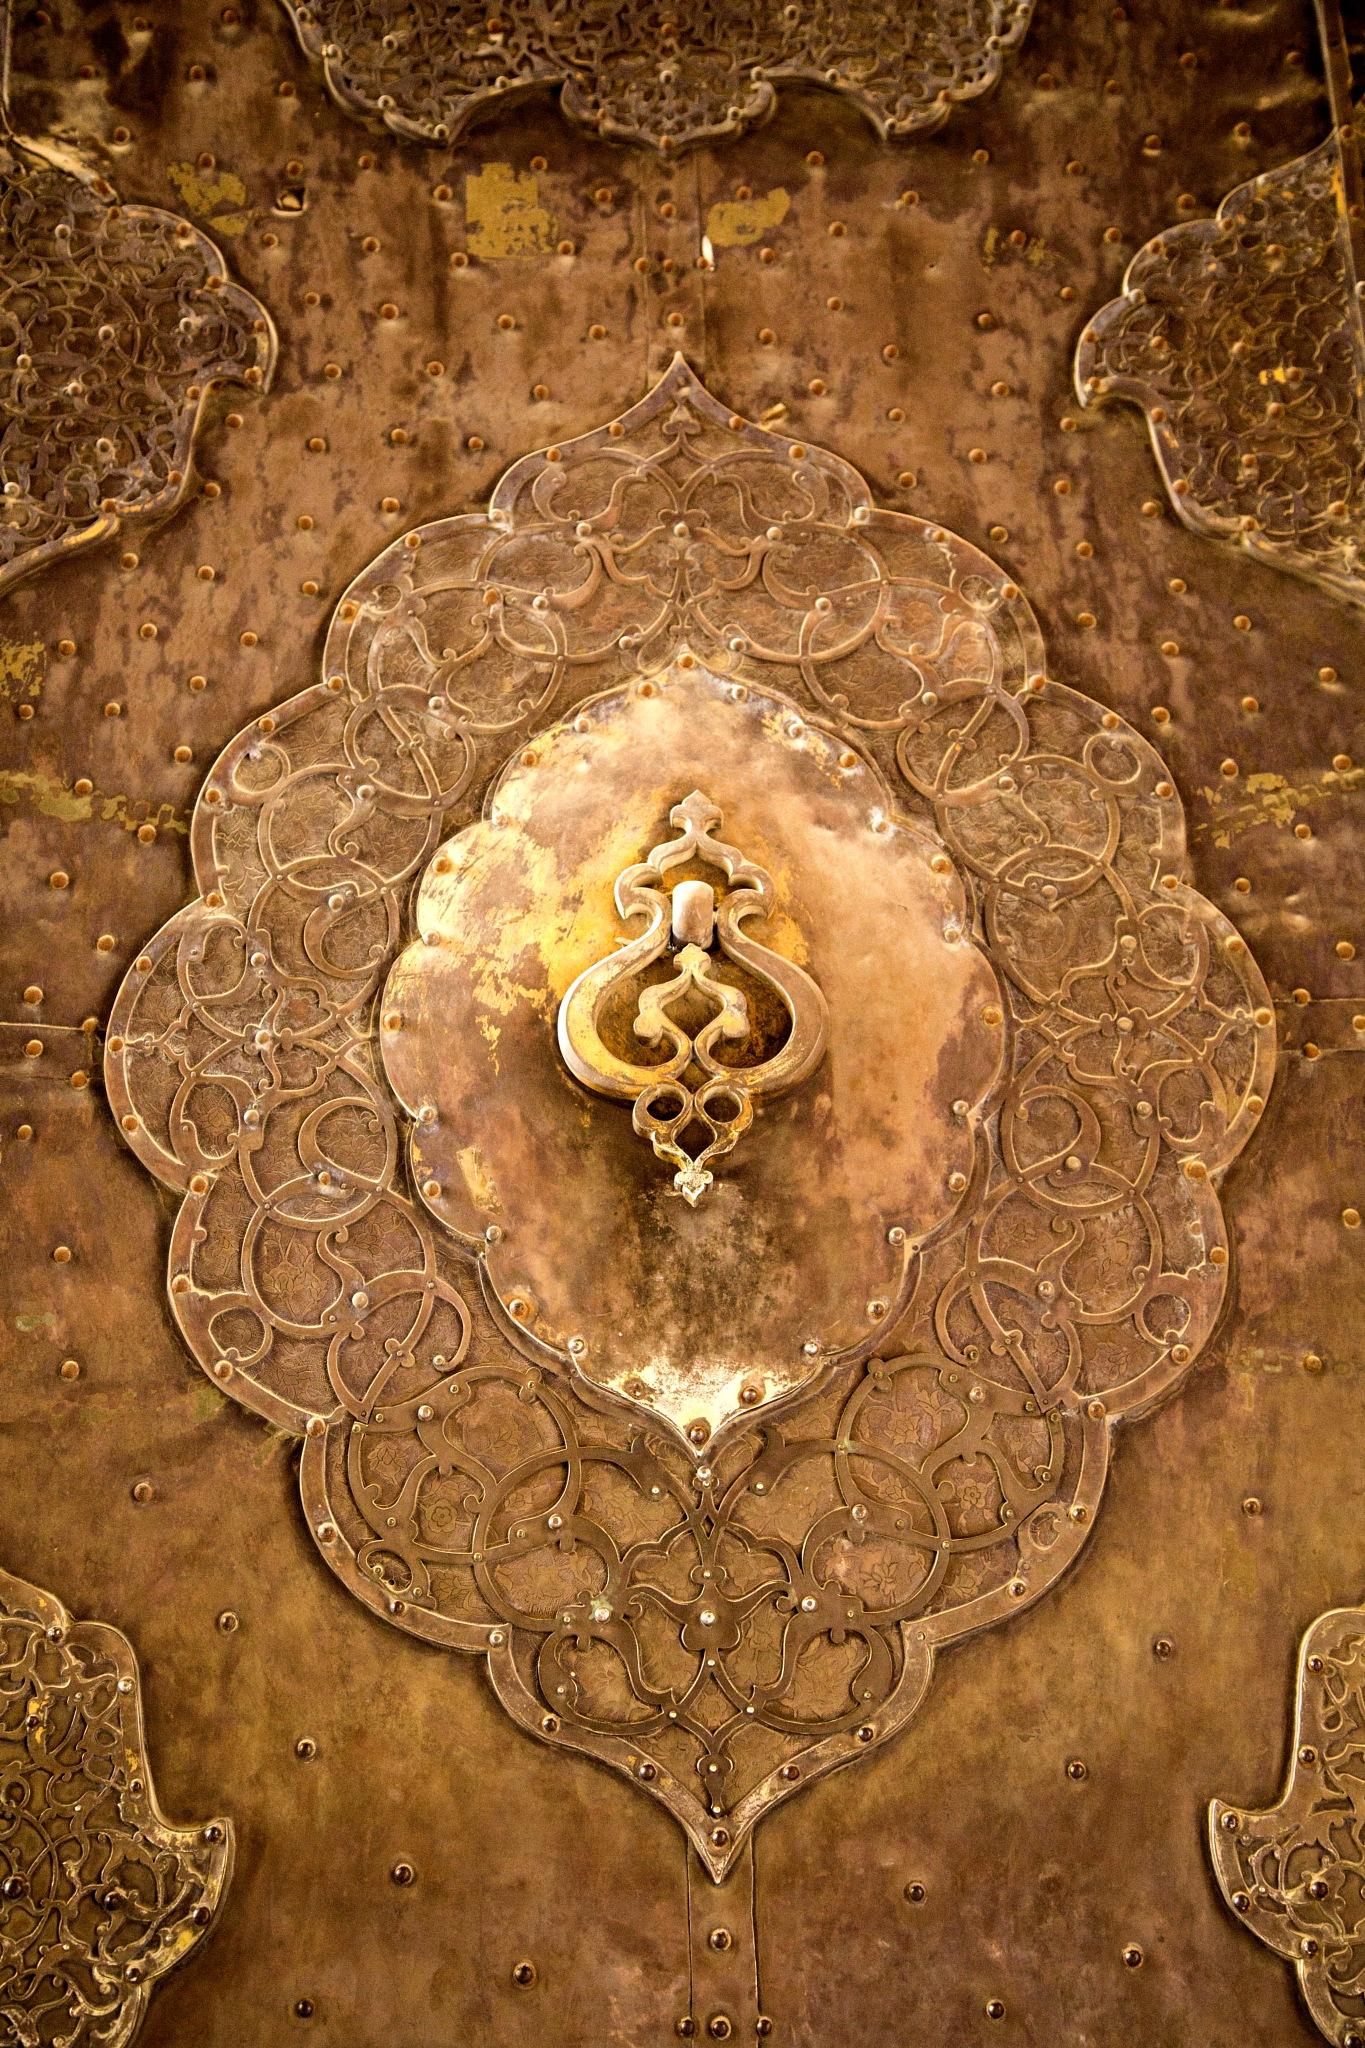 Door of Aalighapoo Palace, Isfahan, Iran - کلون در کاخ عالی قاپو by Babak Javid